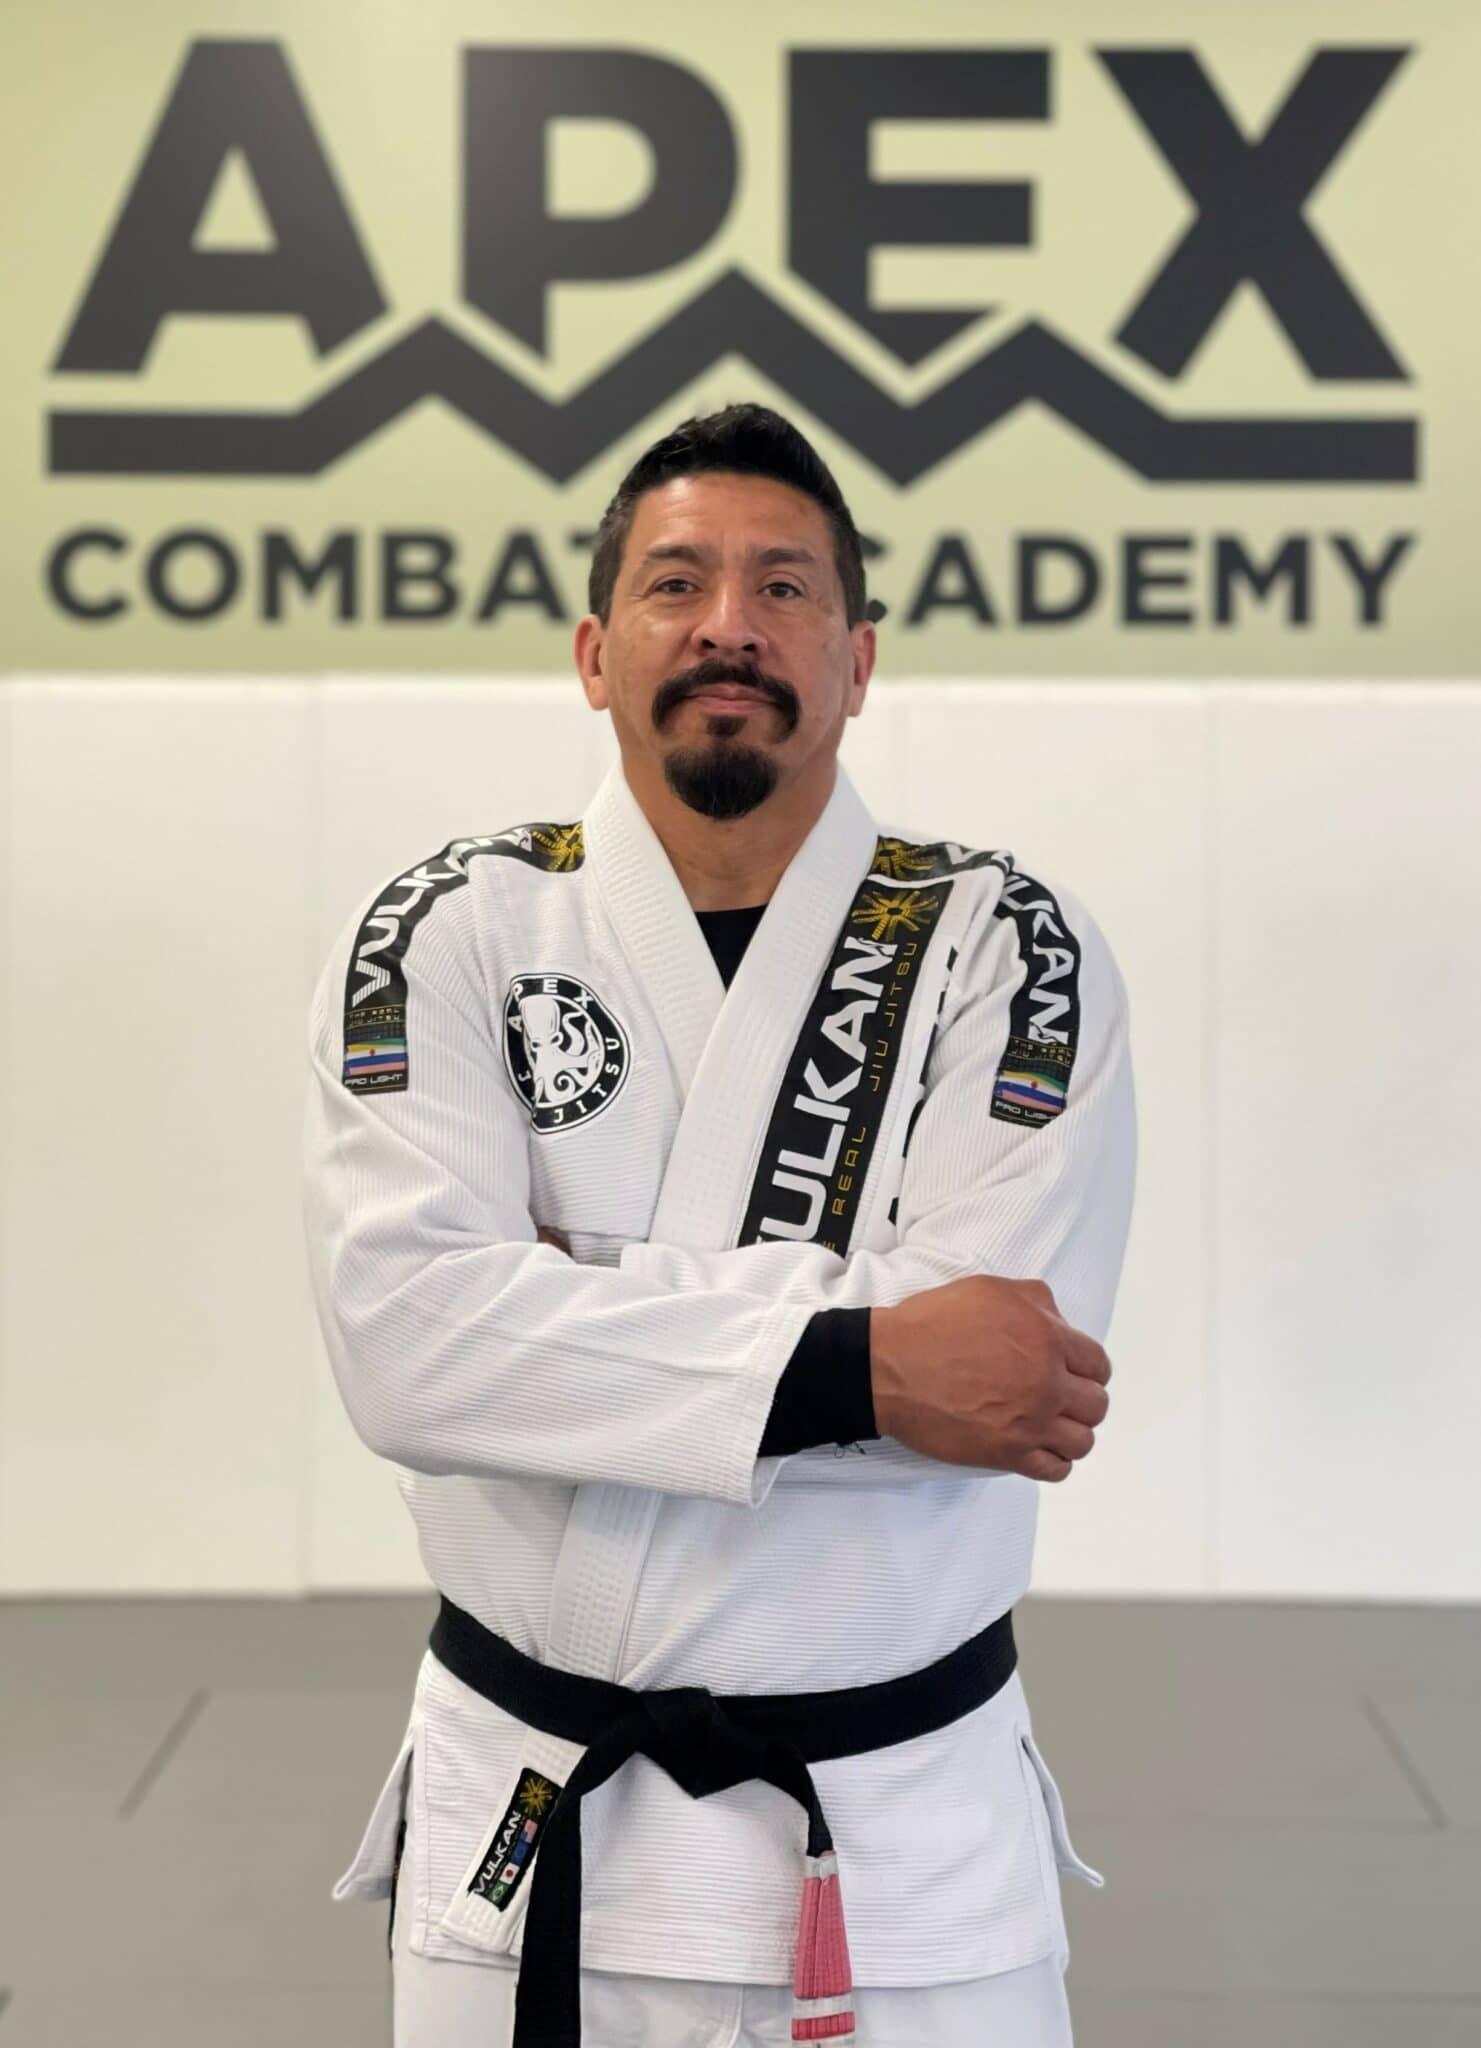 Professor Lee Holloway - Head of Apex Jiu Jitsu